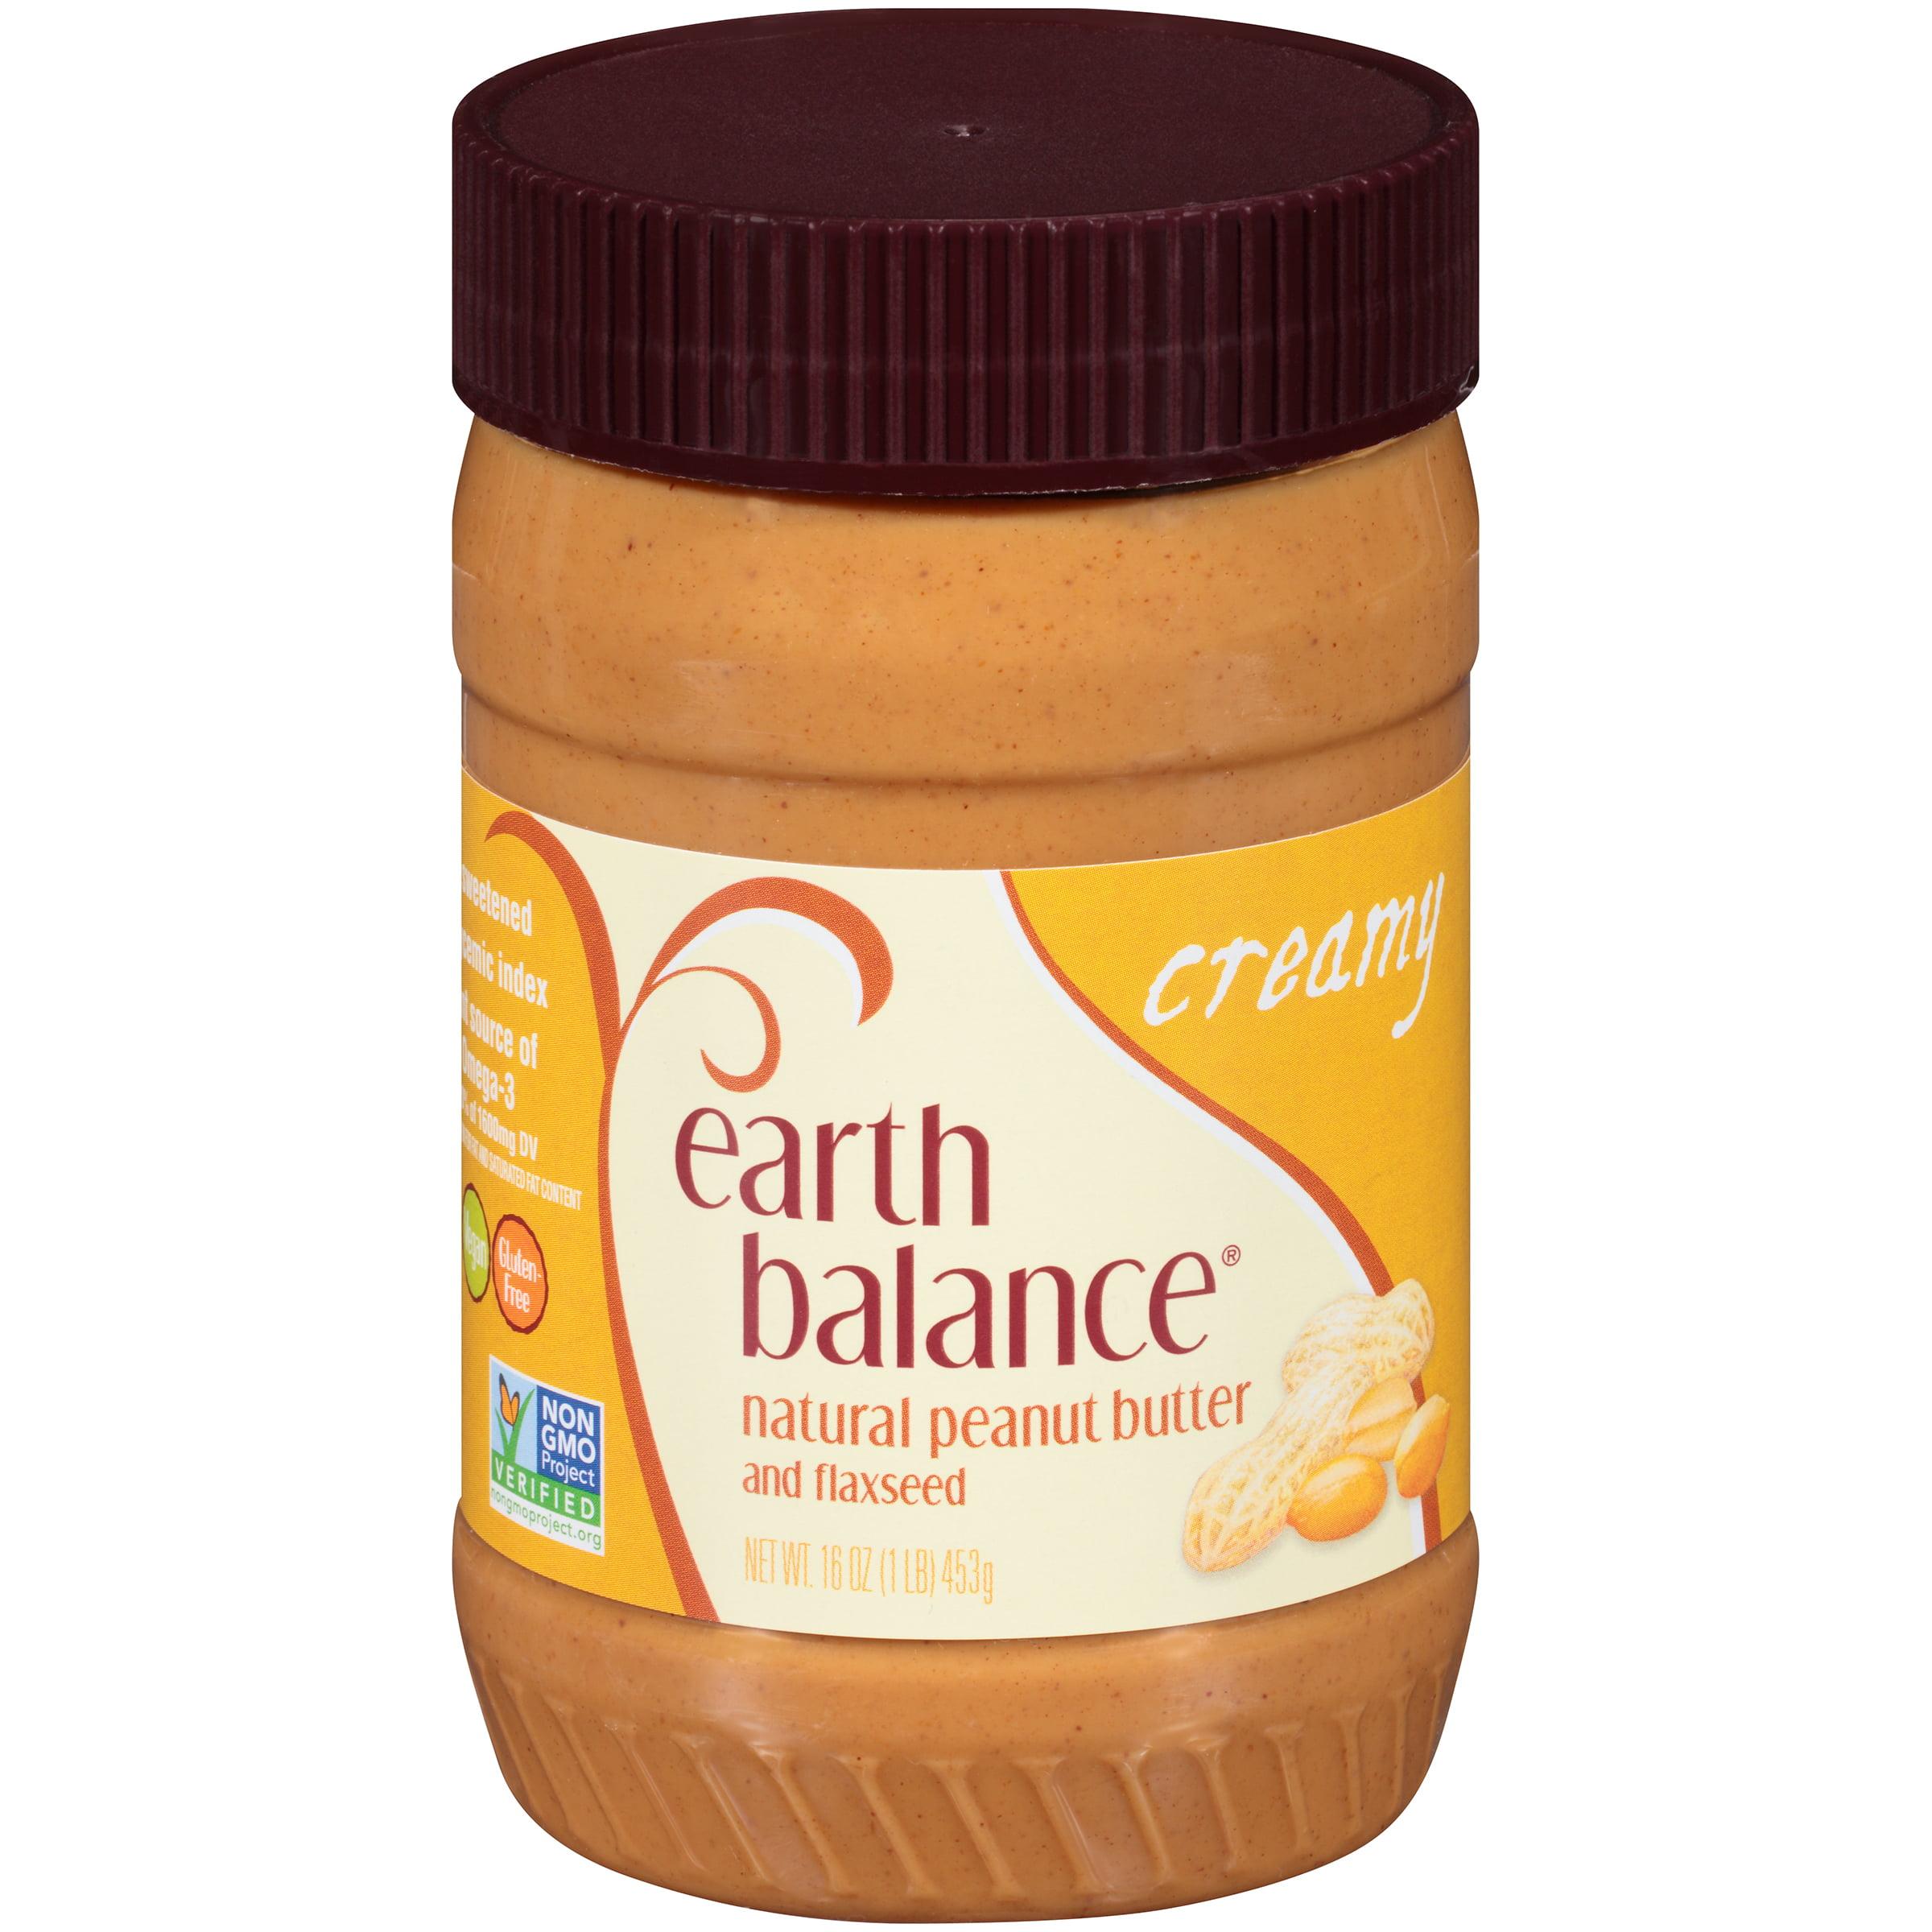 Earth balance peanut butter